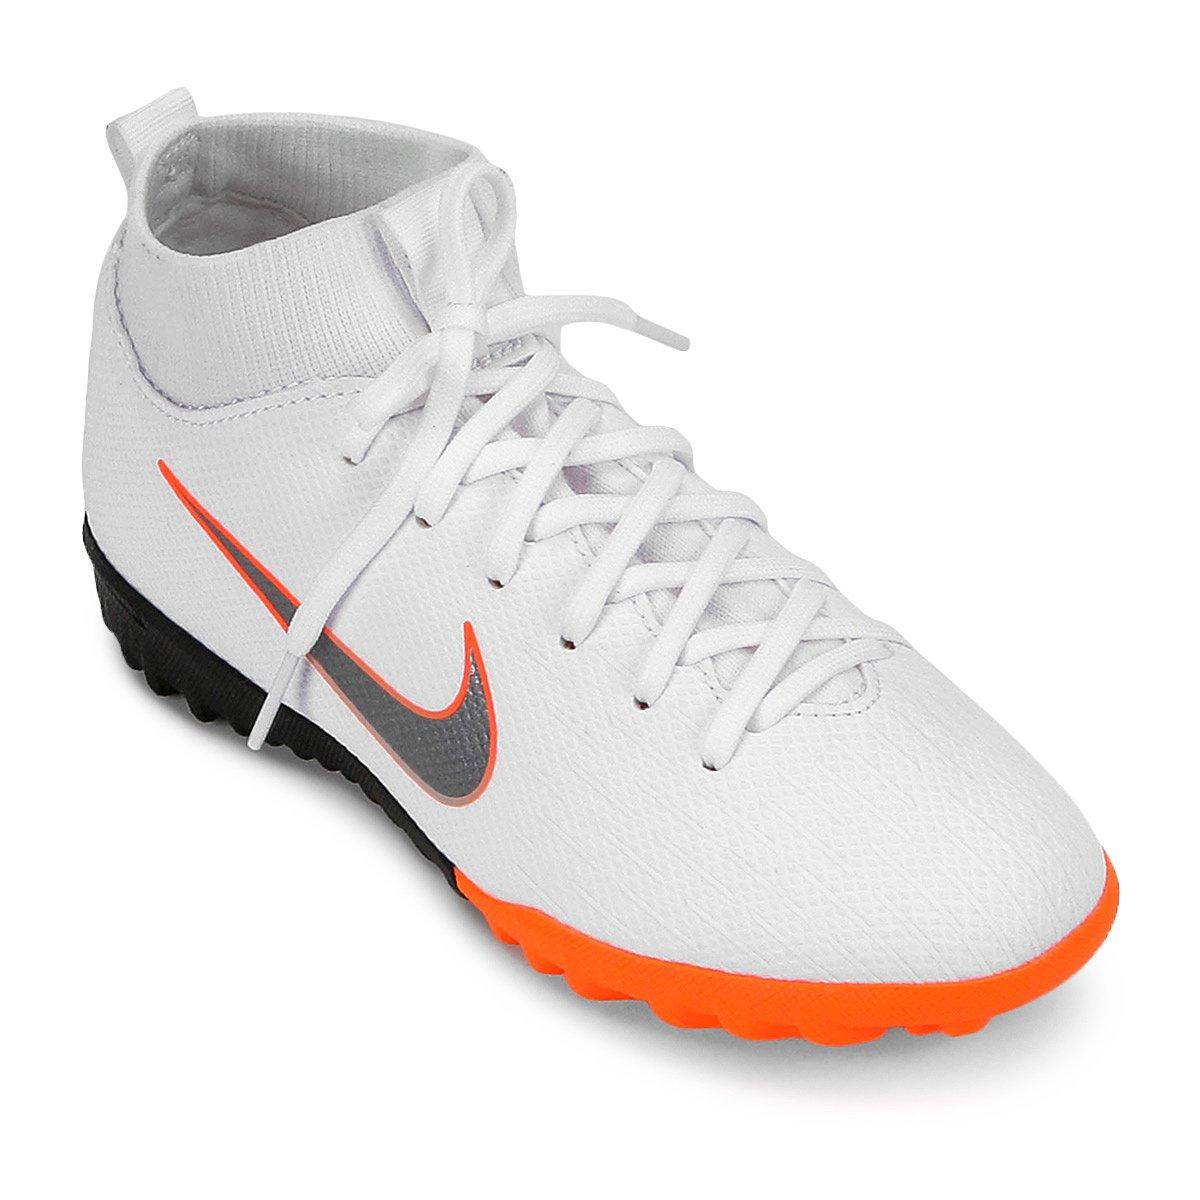 84df5606080a7 Chuteira Society Infantil Nike Mercurial Superfly 6 Academy GS TF - Compre  Agora